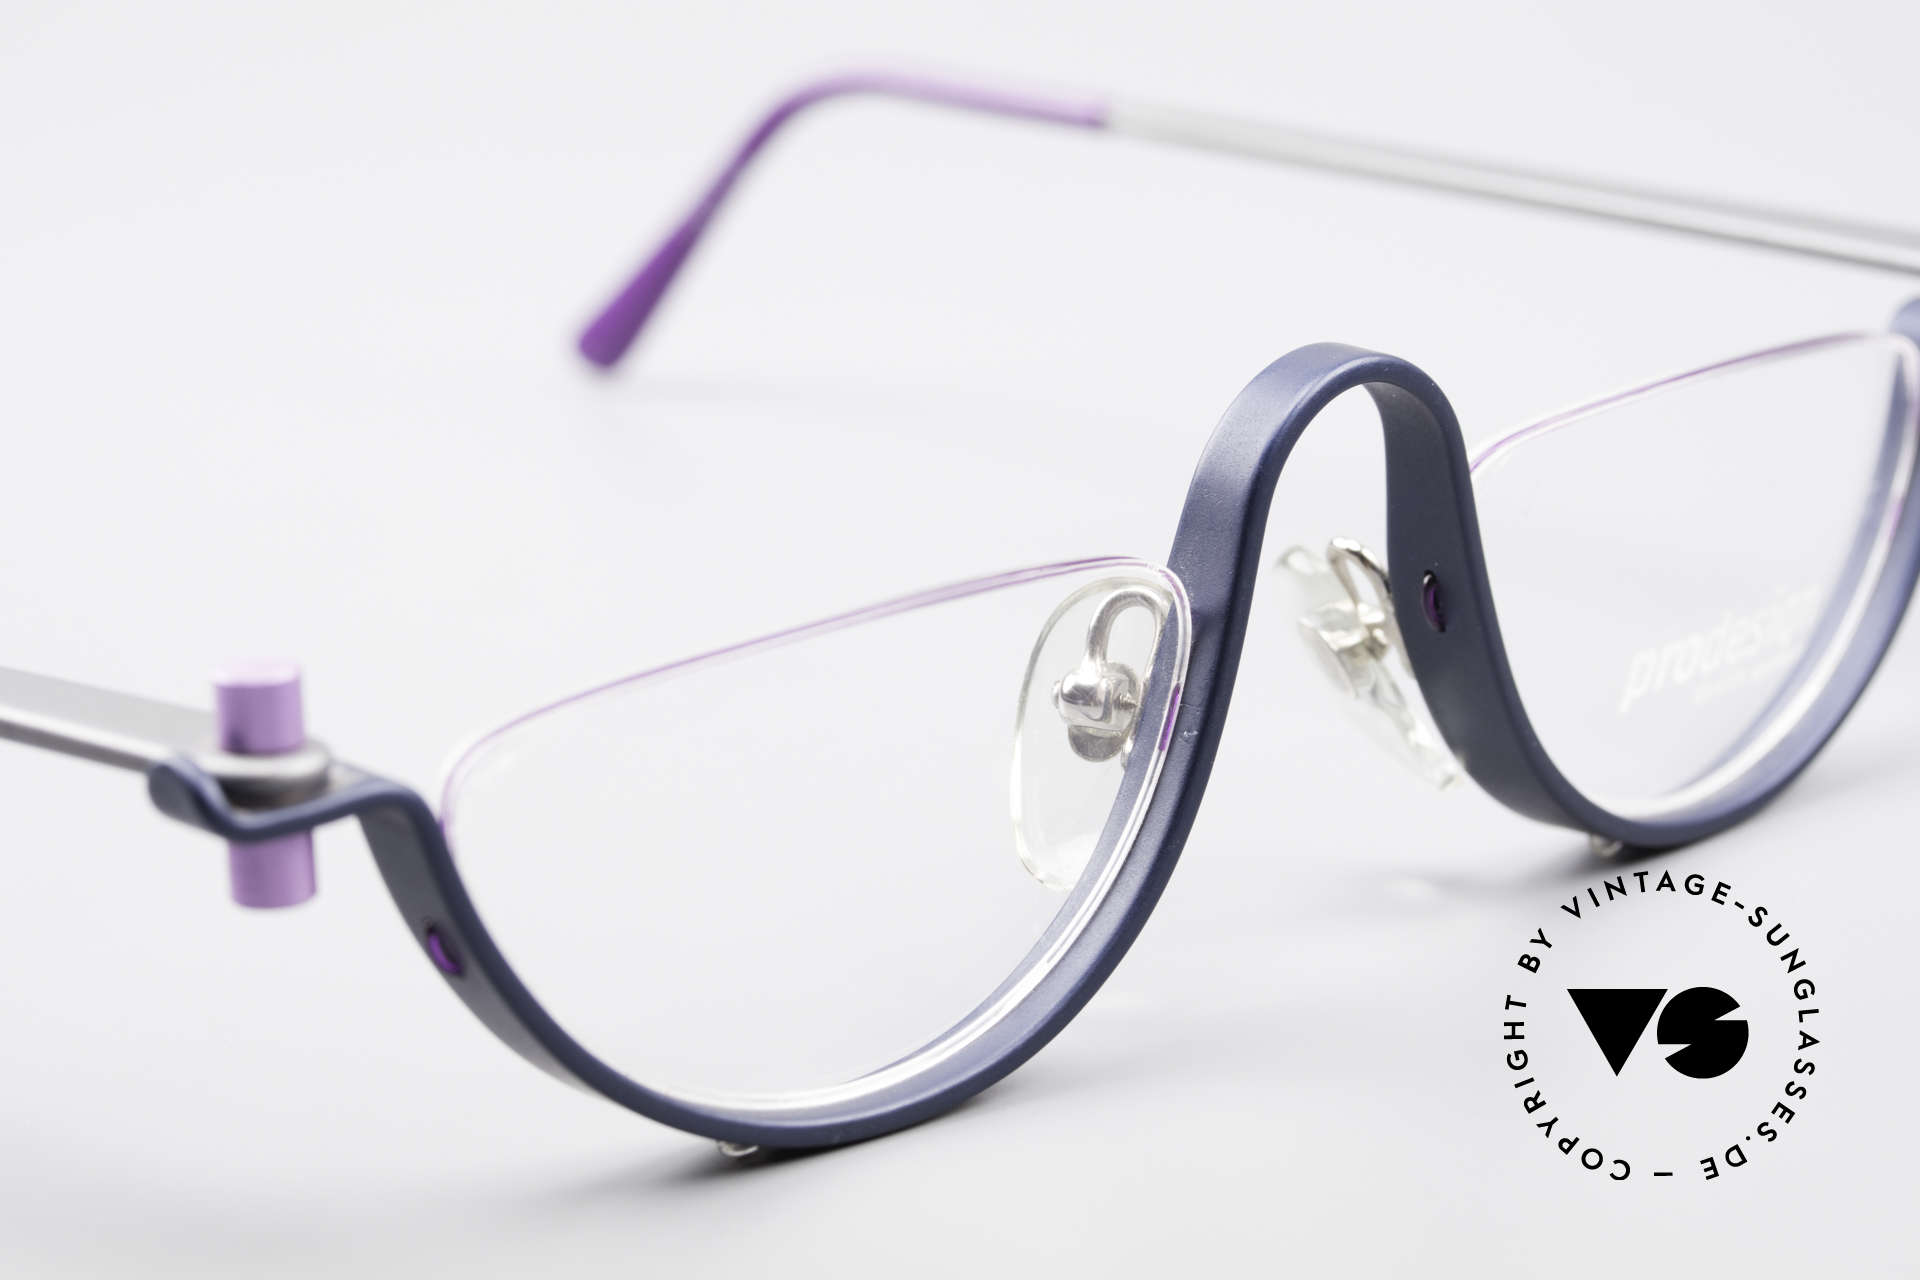 Www Pro Design Com glasses prodesign no1 half gail spence design glasses